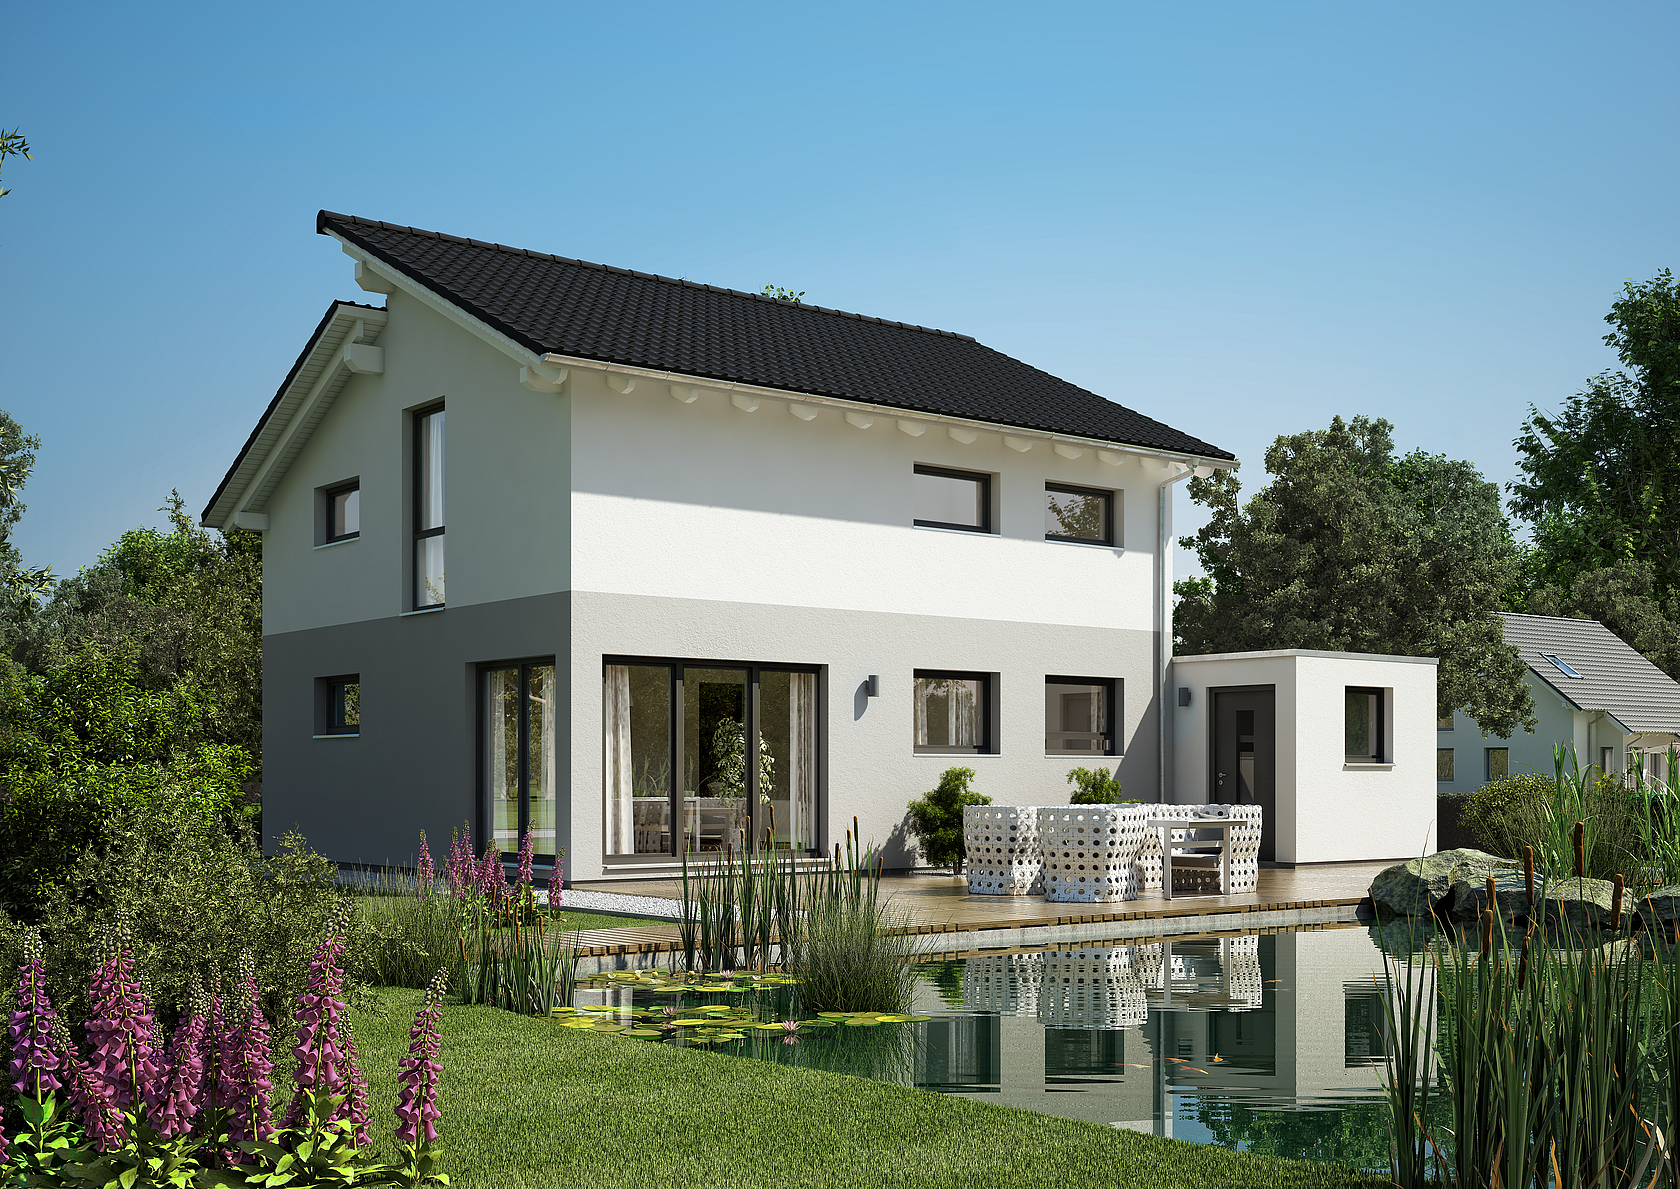 familienhaus loop pult von kern haus modernes pultdach. Black Bedroom Furniture Sets. Home Design Ideas